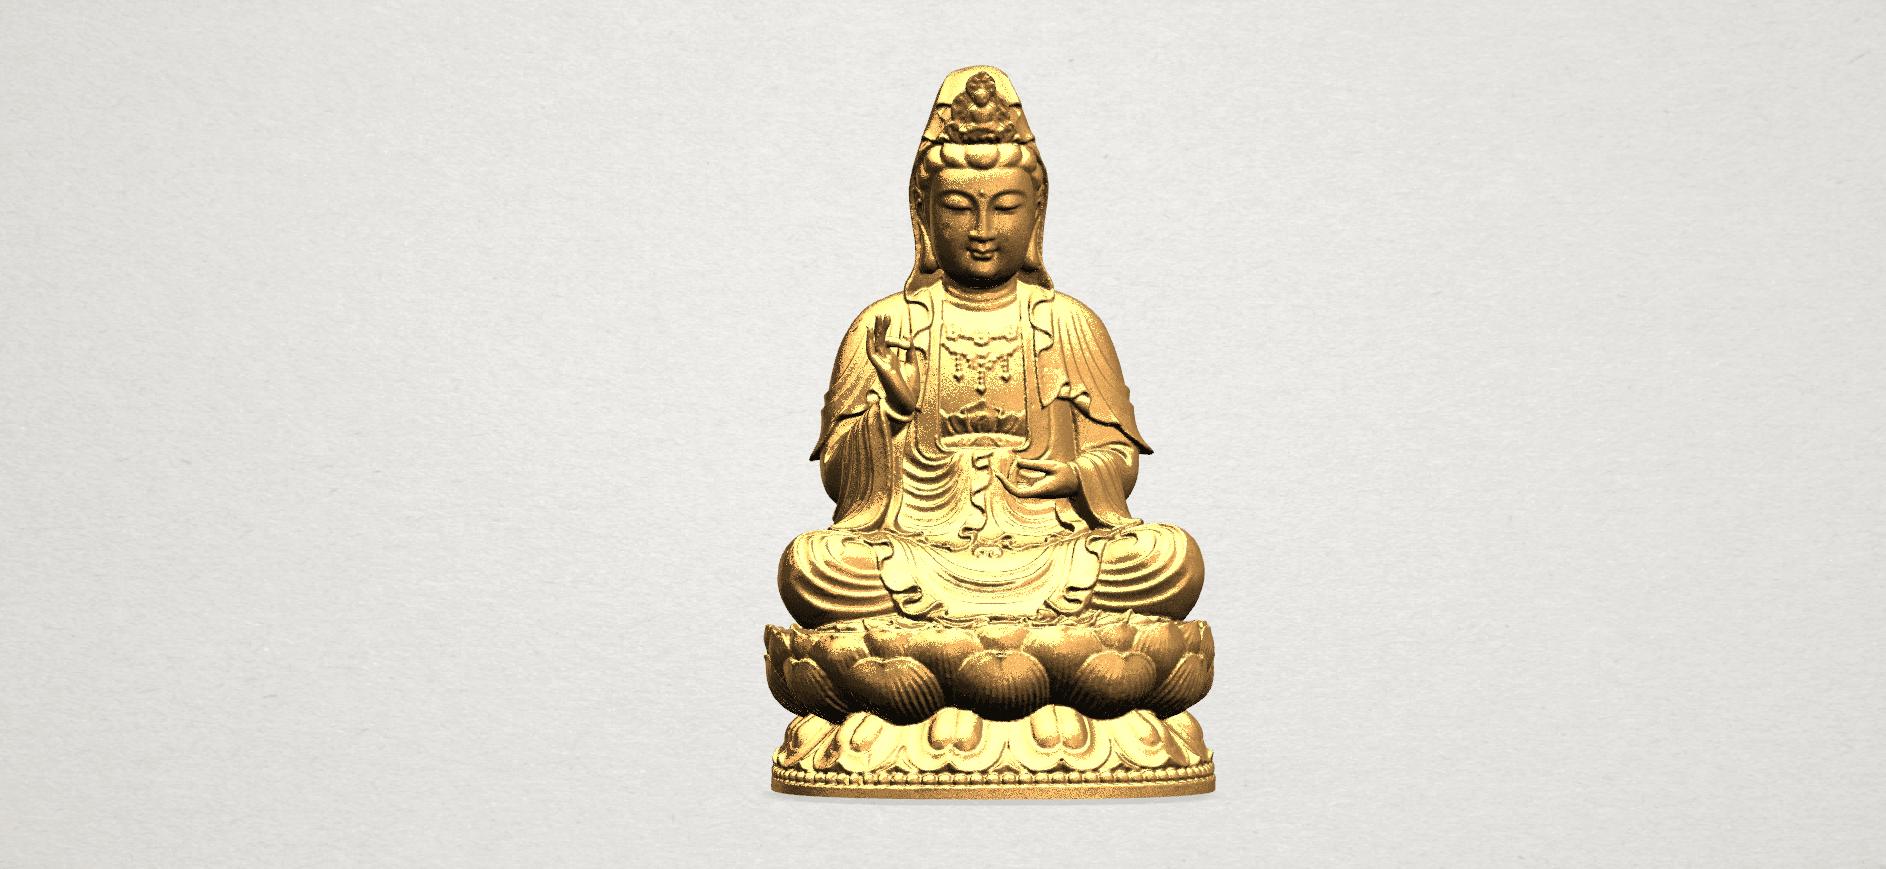 Bodhisattva Buddha - B01.png Download free STL file Avalokitesvara Bodhisattva 01 • 3D print object, GeorgesNikkei